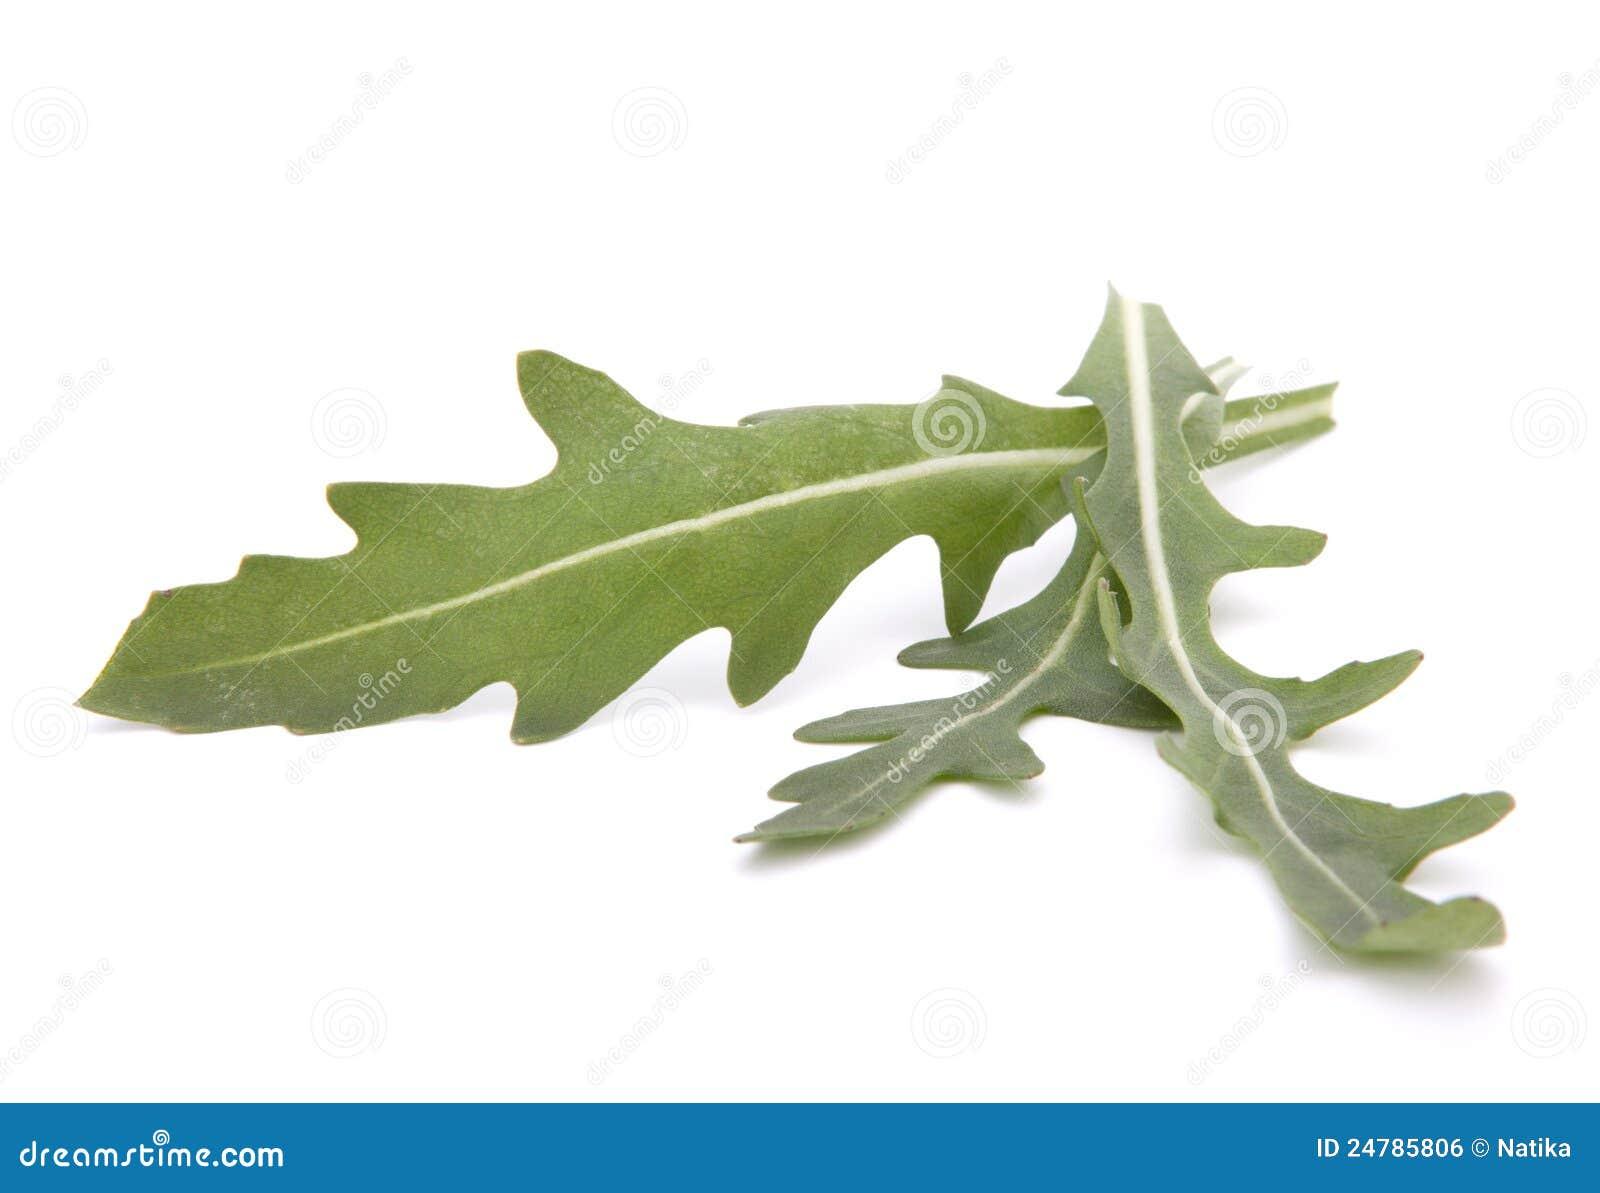 sweet rucola salad or rocket lettuce leaves royalty free